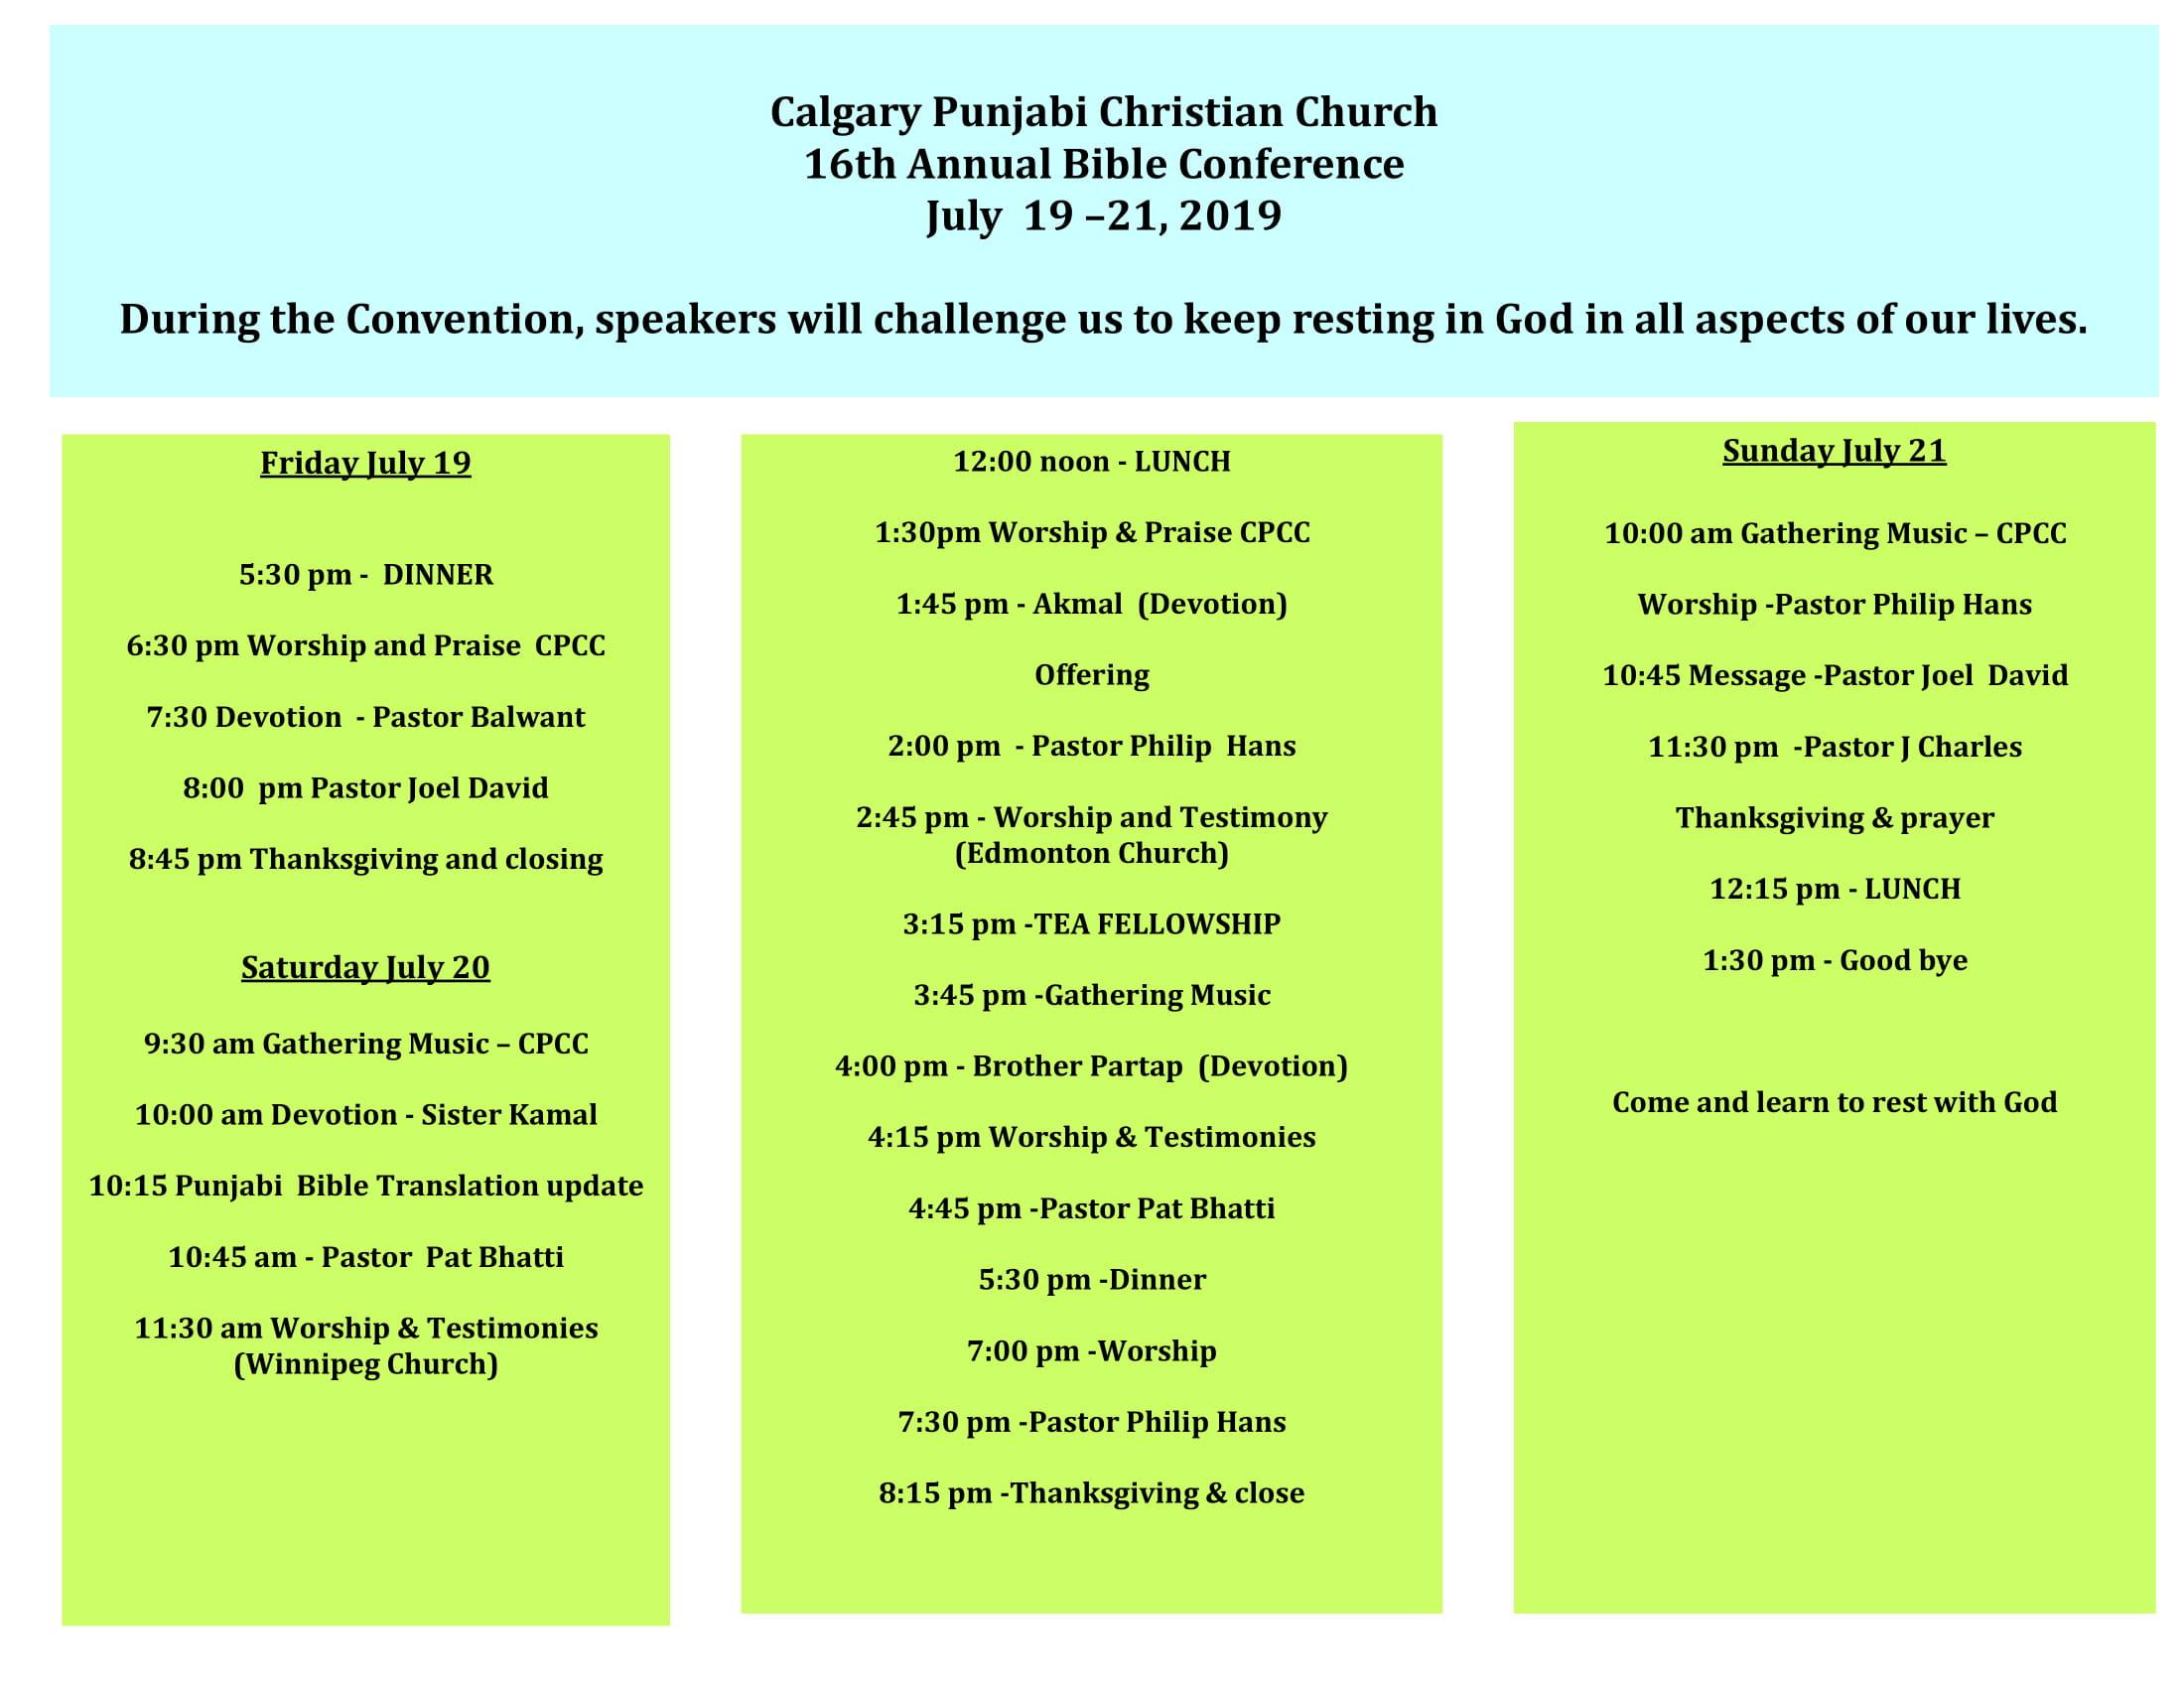 Annual Bible Conference 2019 - Calgary Punjabi Church